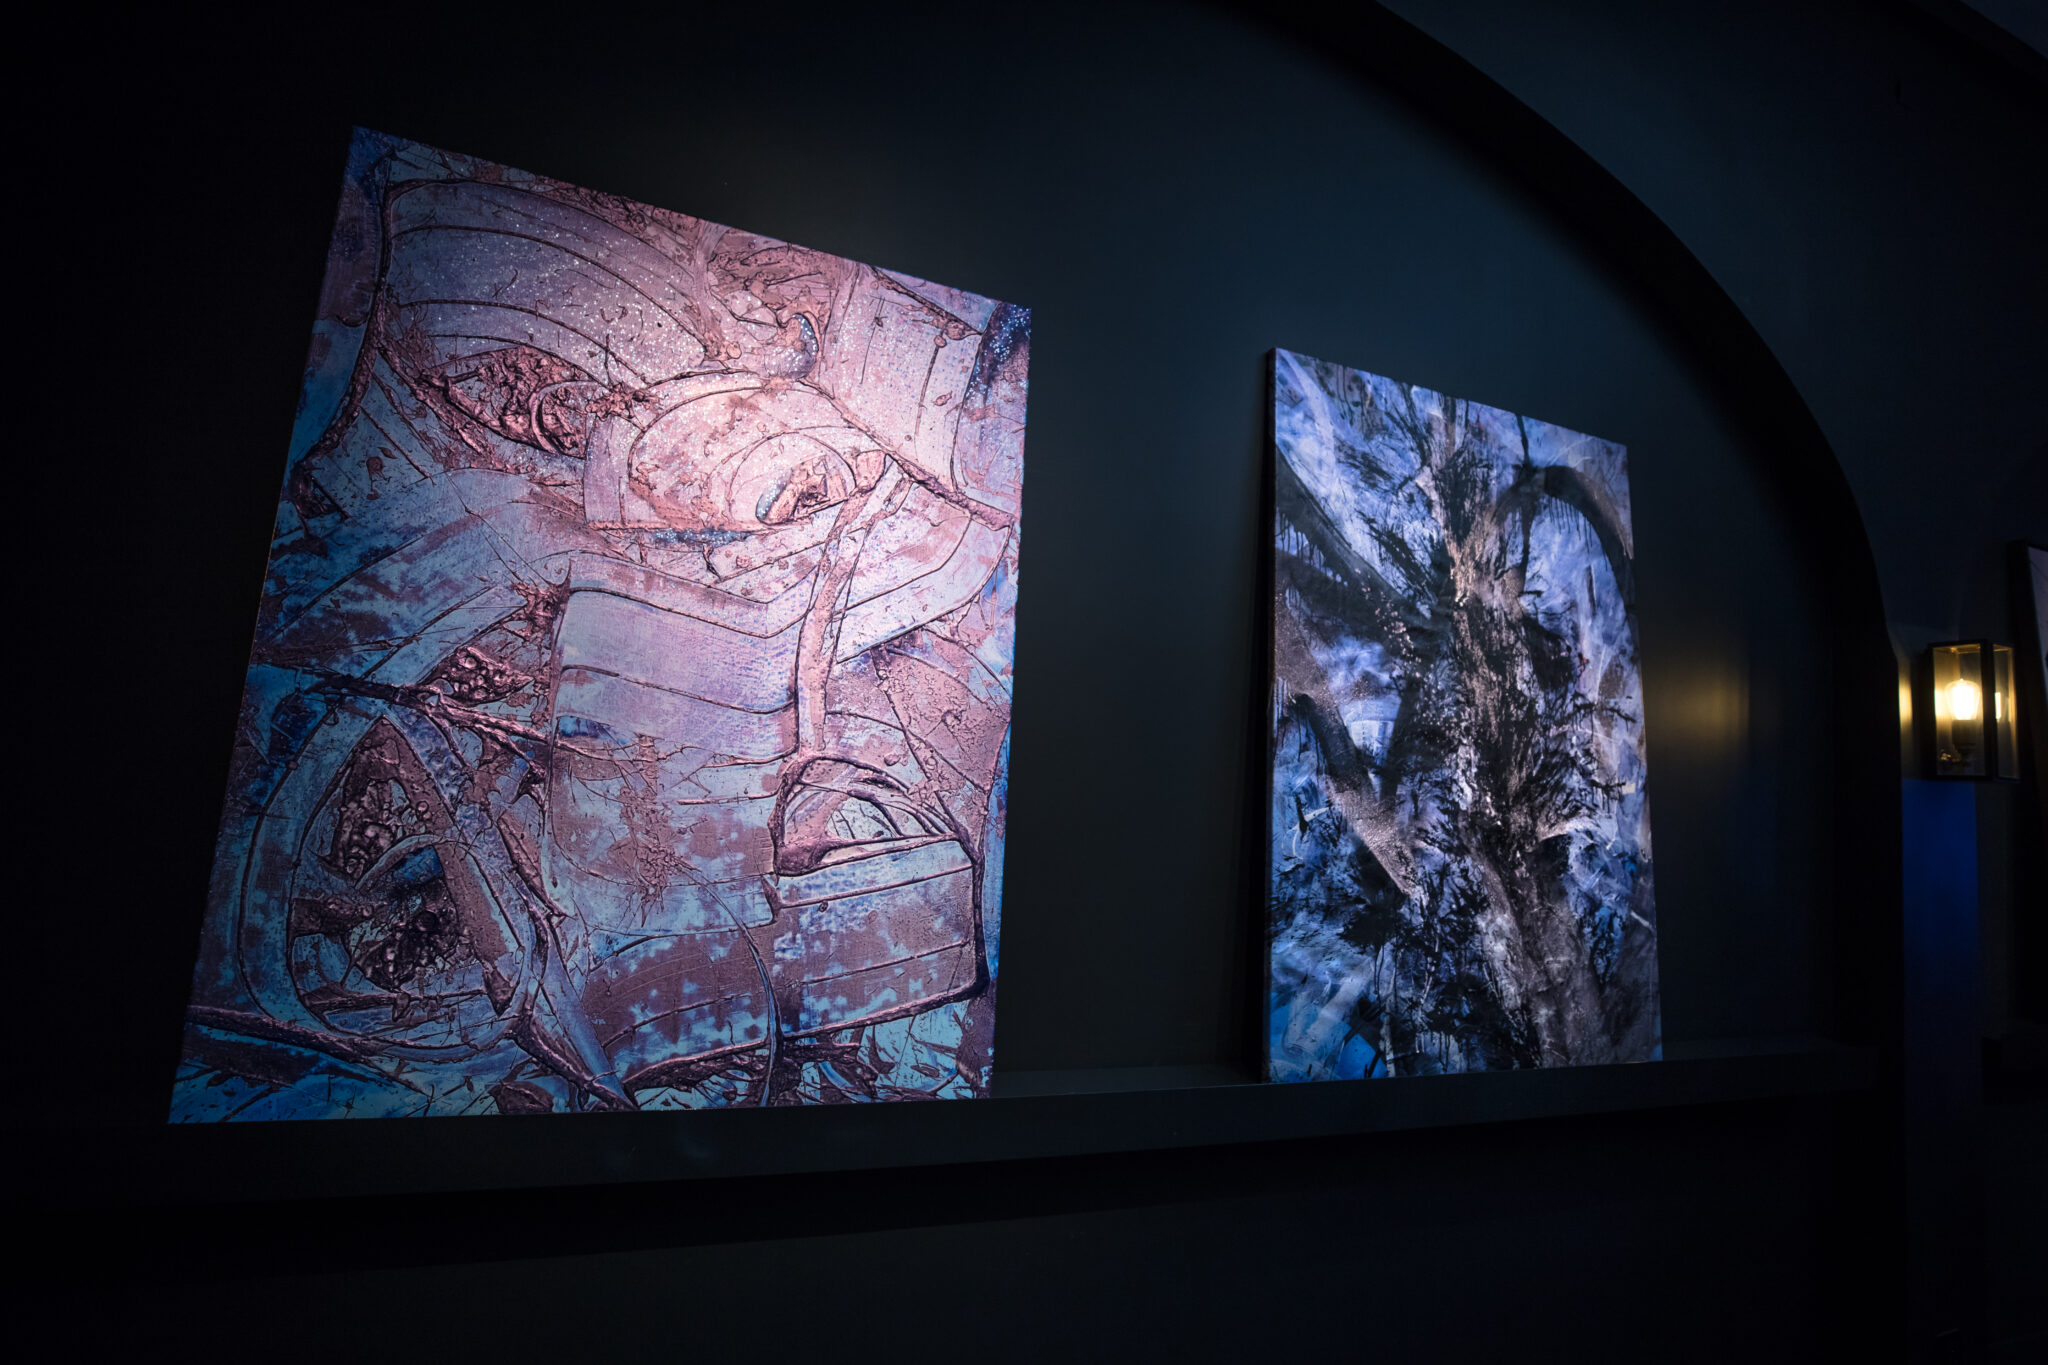 audrey-hatchikian-gallery-expo-momentum-art-septembre-2018